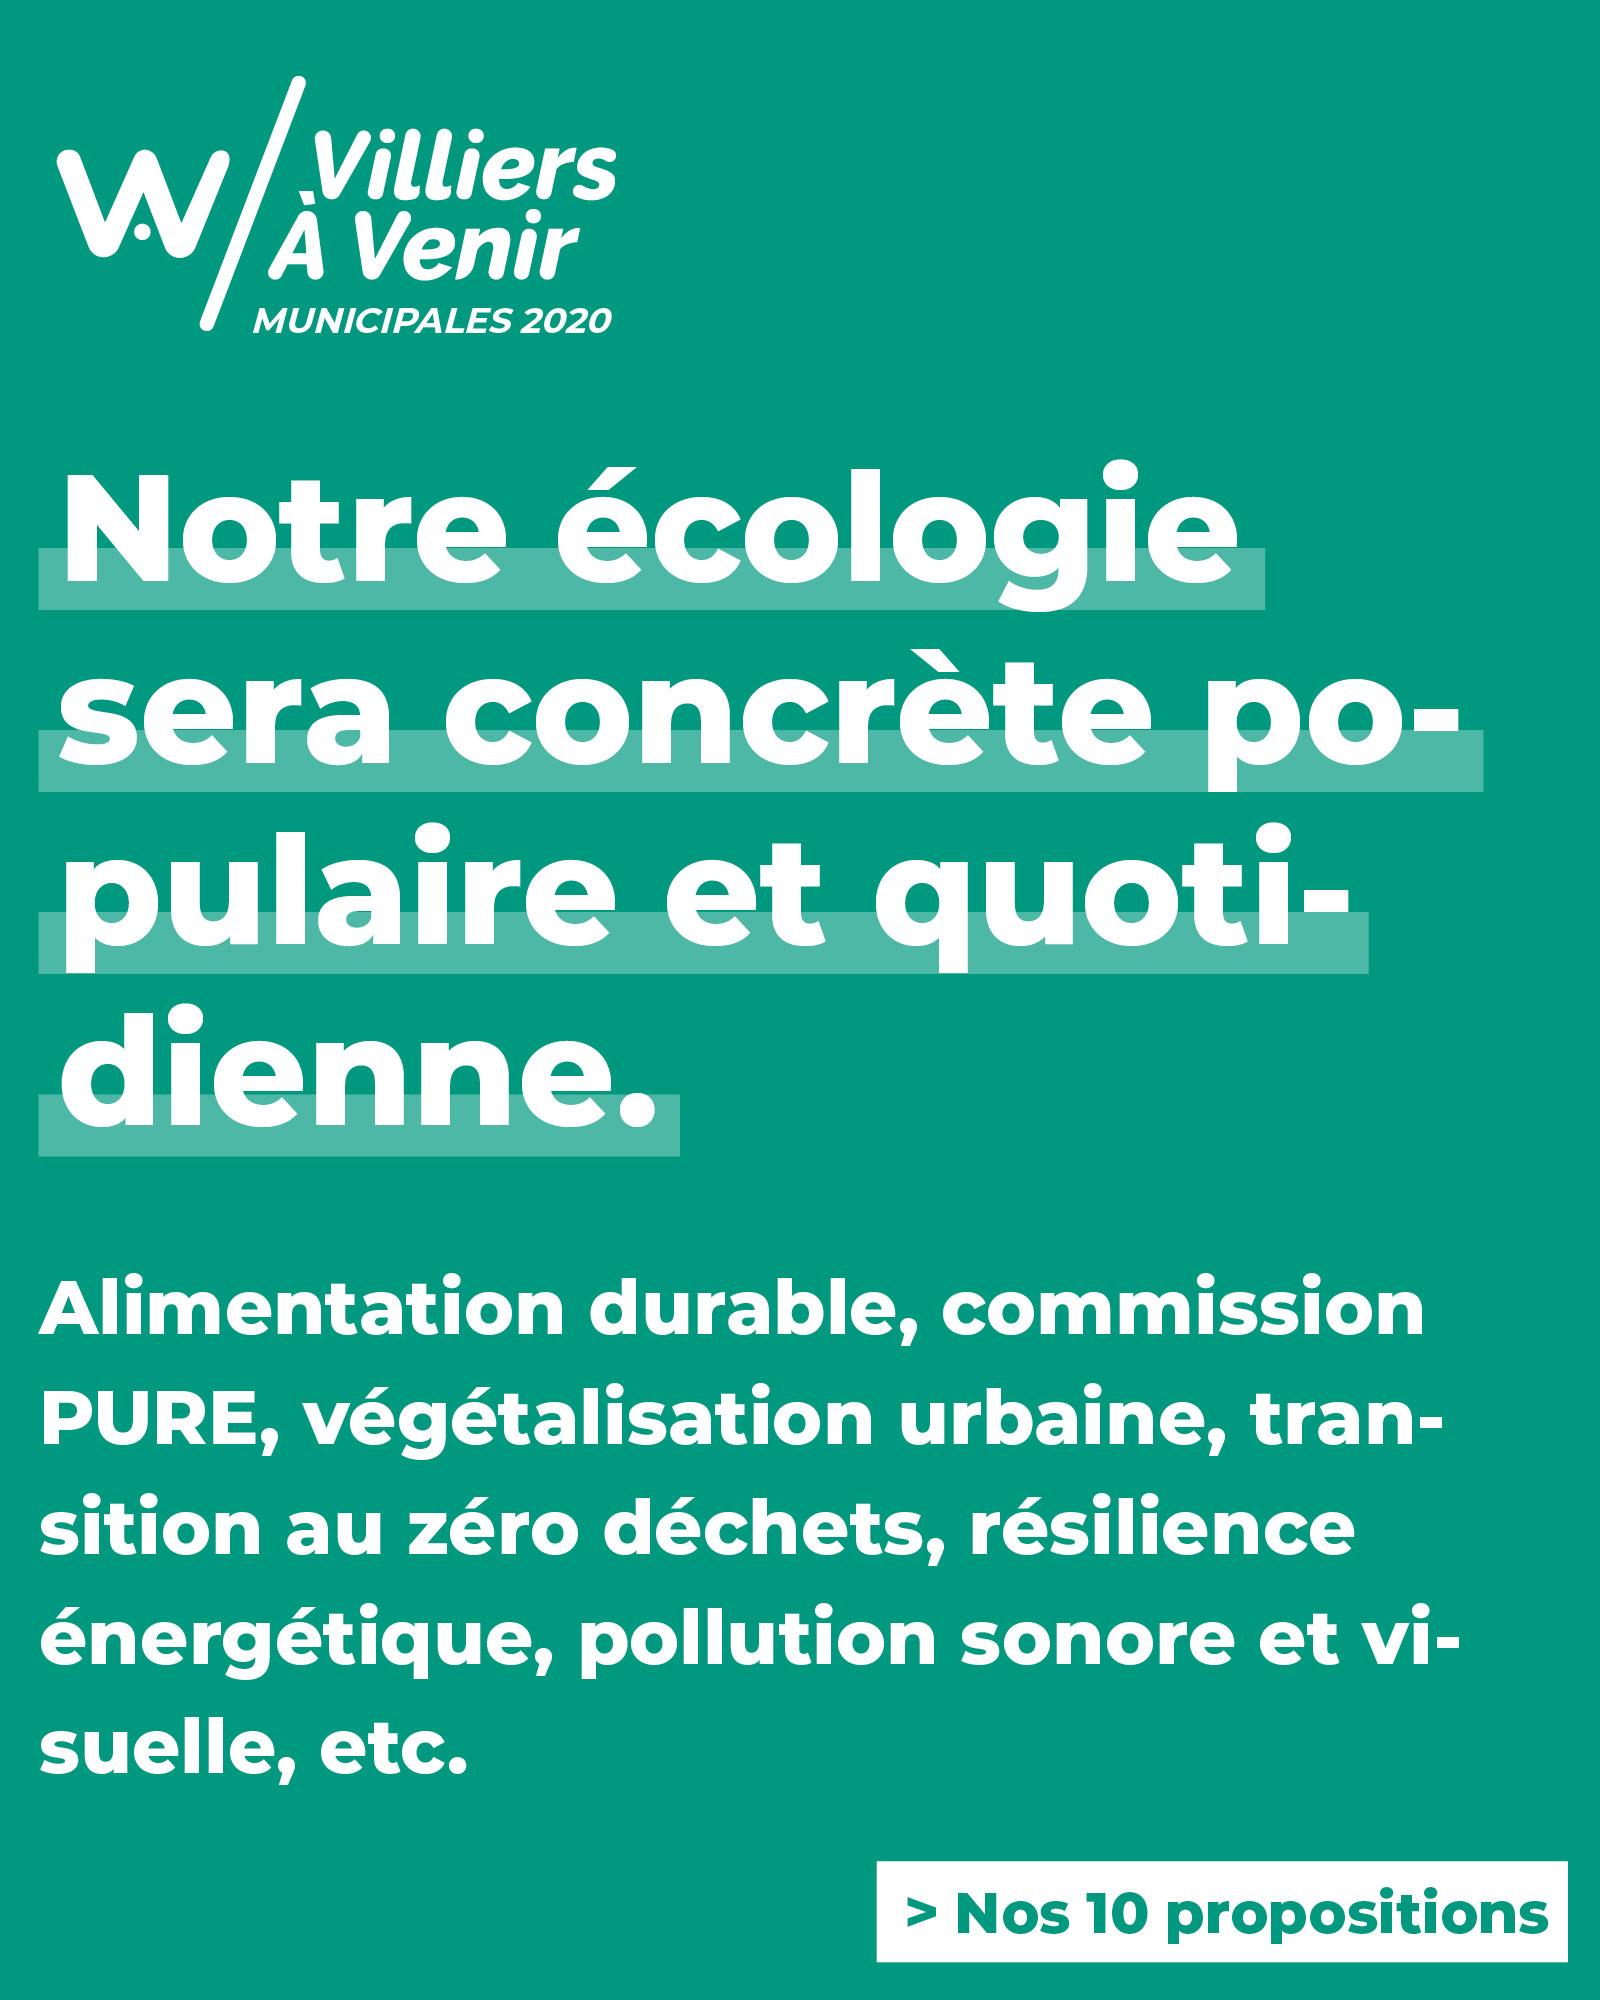 https://vav94.fr/wp-content/uploads/2020/03/ECOLOGIE-VILLIERS-A-VENIR-PROGRAMME-MUNICIPALES-2020-VILLIERS-SUR-MARNE-1.jpg